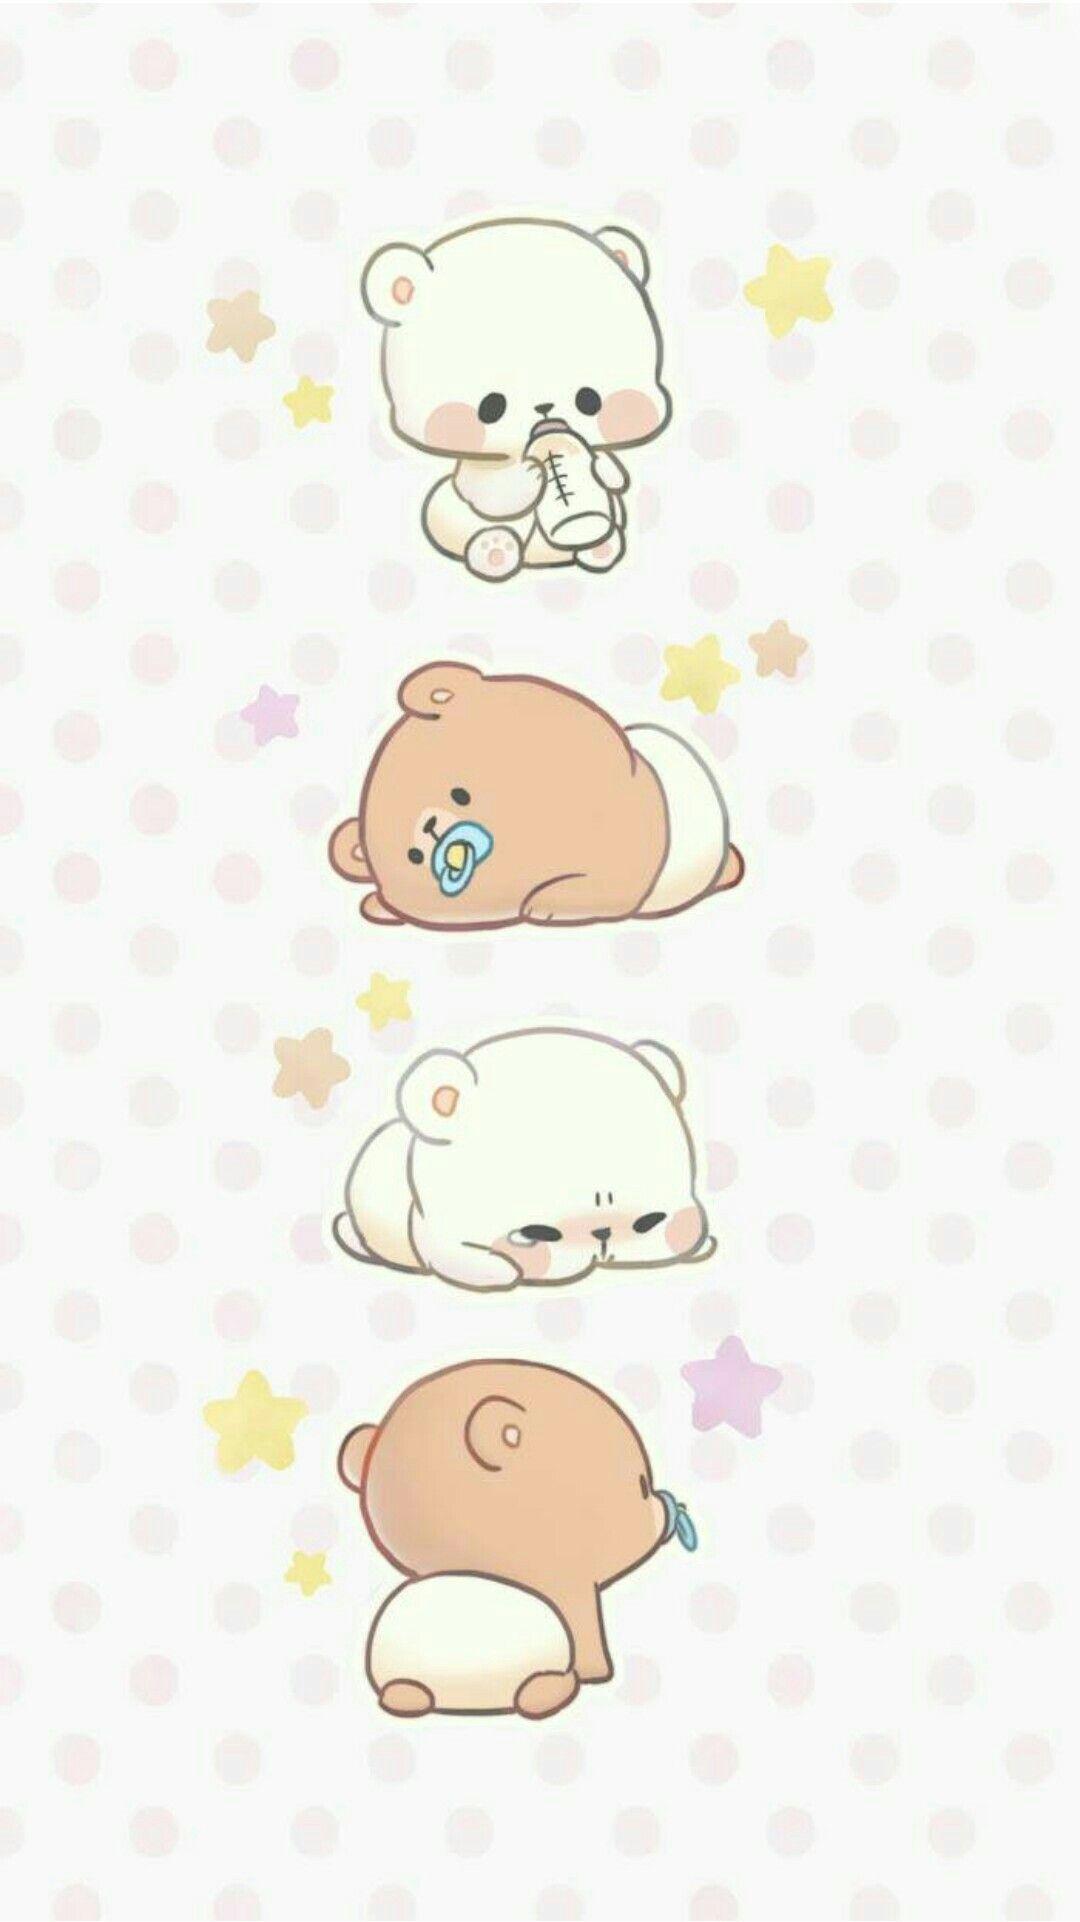 Baby Milk Baby Mocha 3 Cute Bear Drawings Baby Cartoon Drawing Cute Kawaii Animals